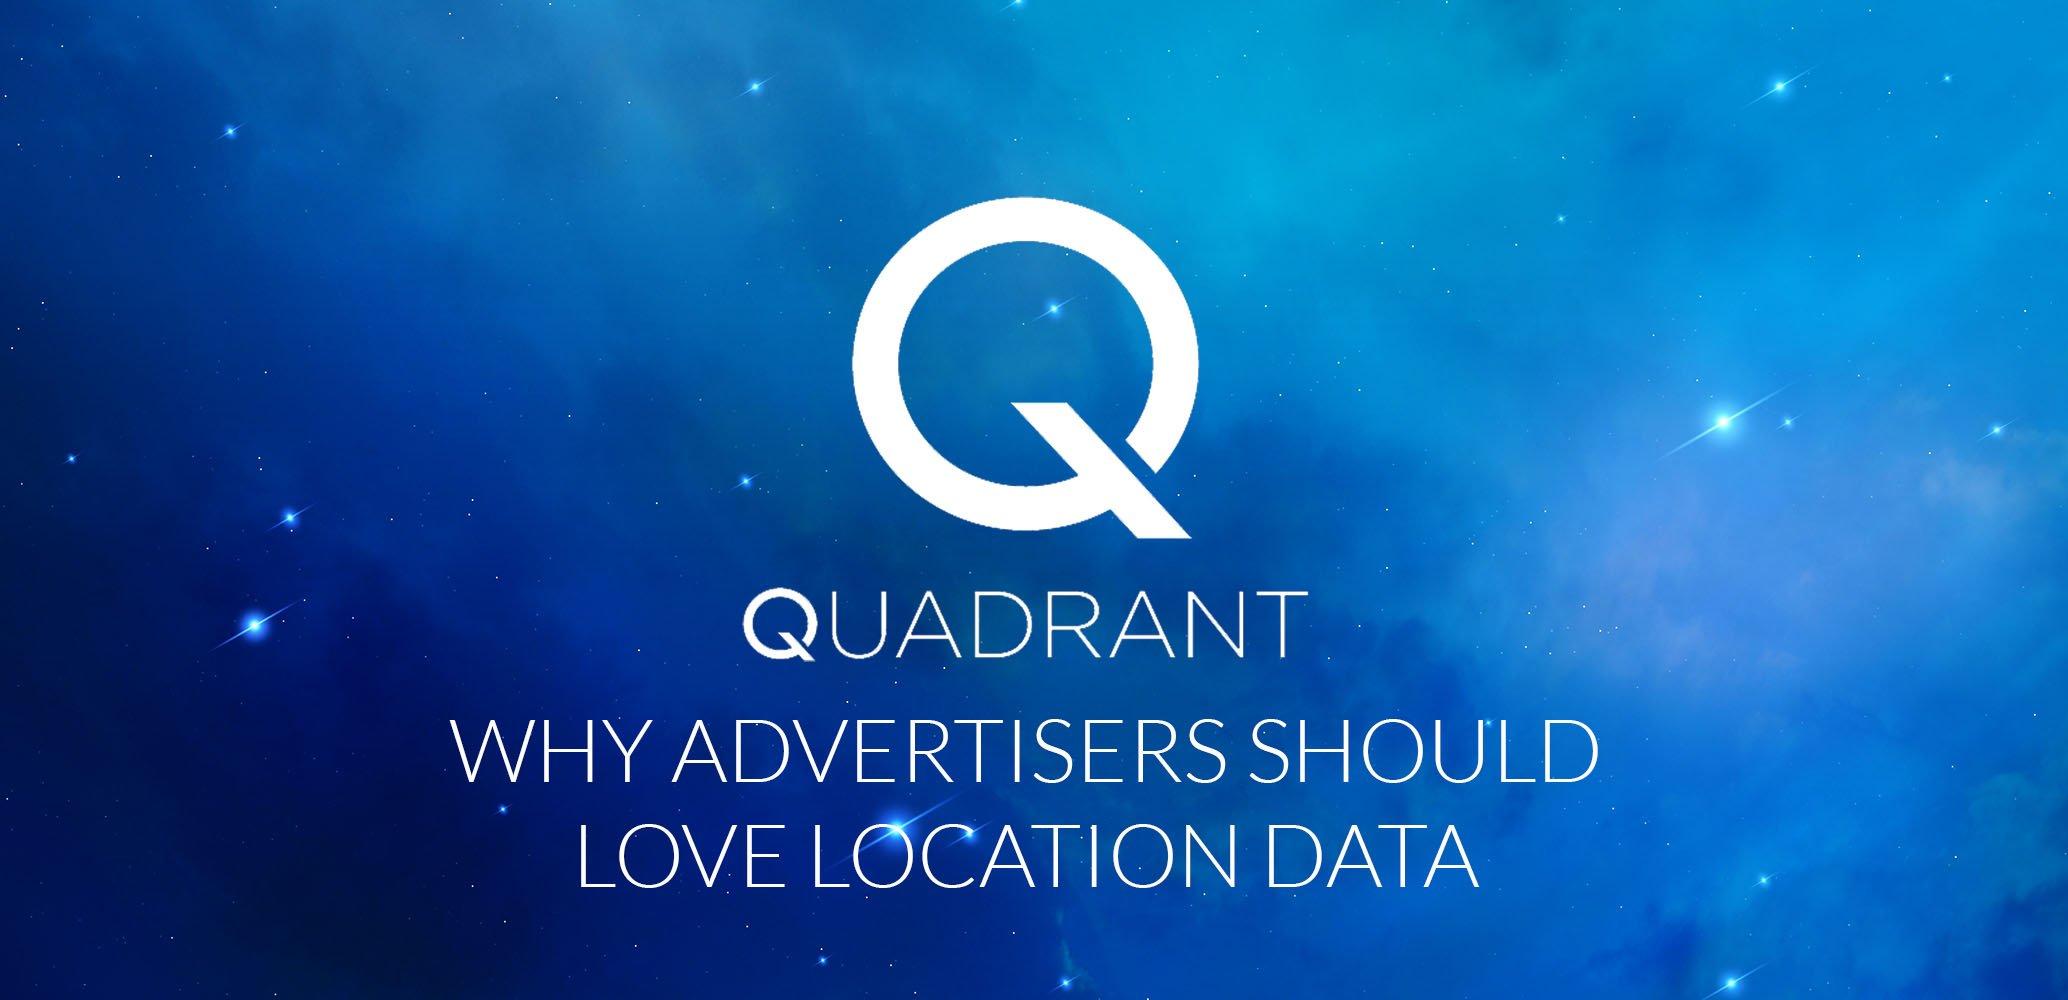 MediumArticle - Love Location Data